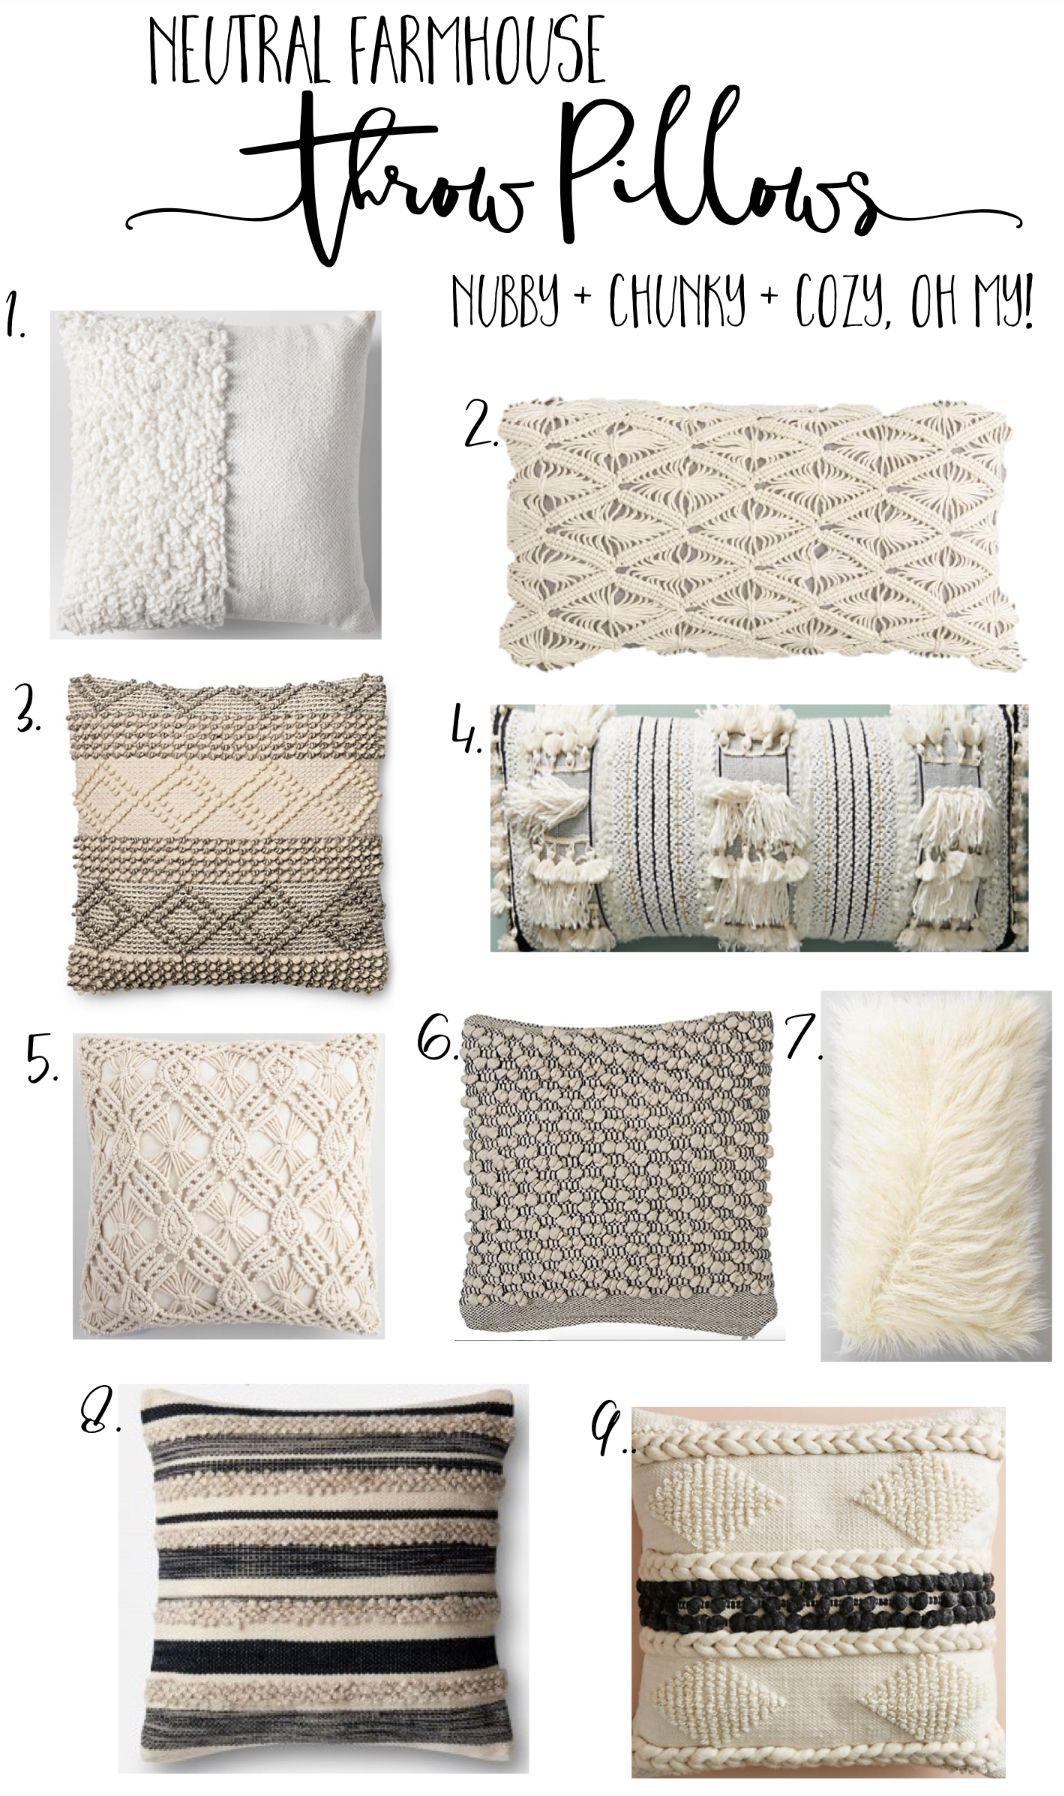 Cozy nubby chunky farmhouse pillows in all budgets